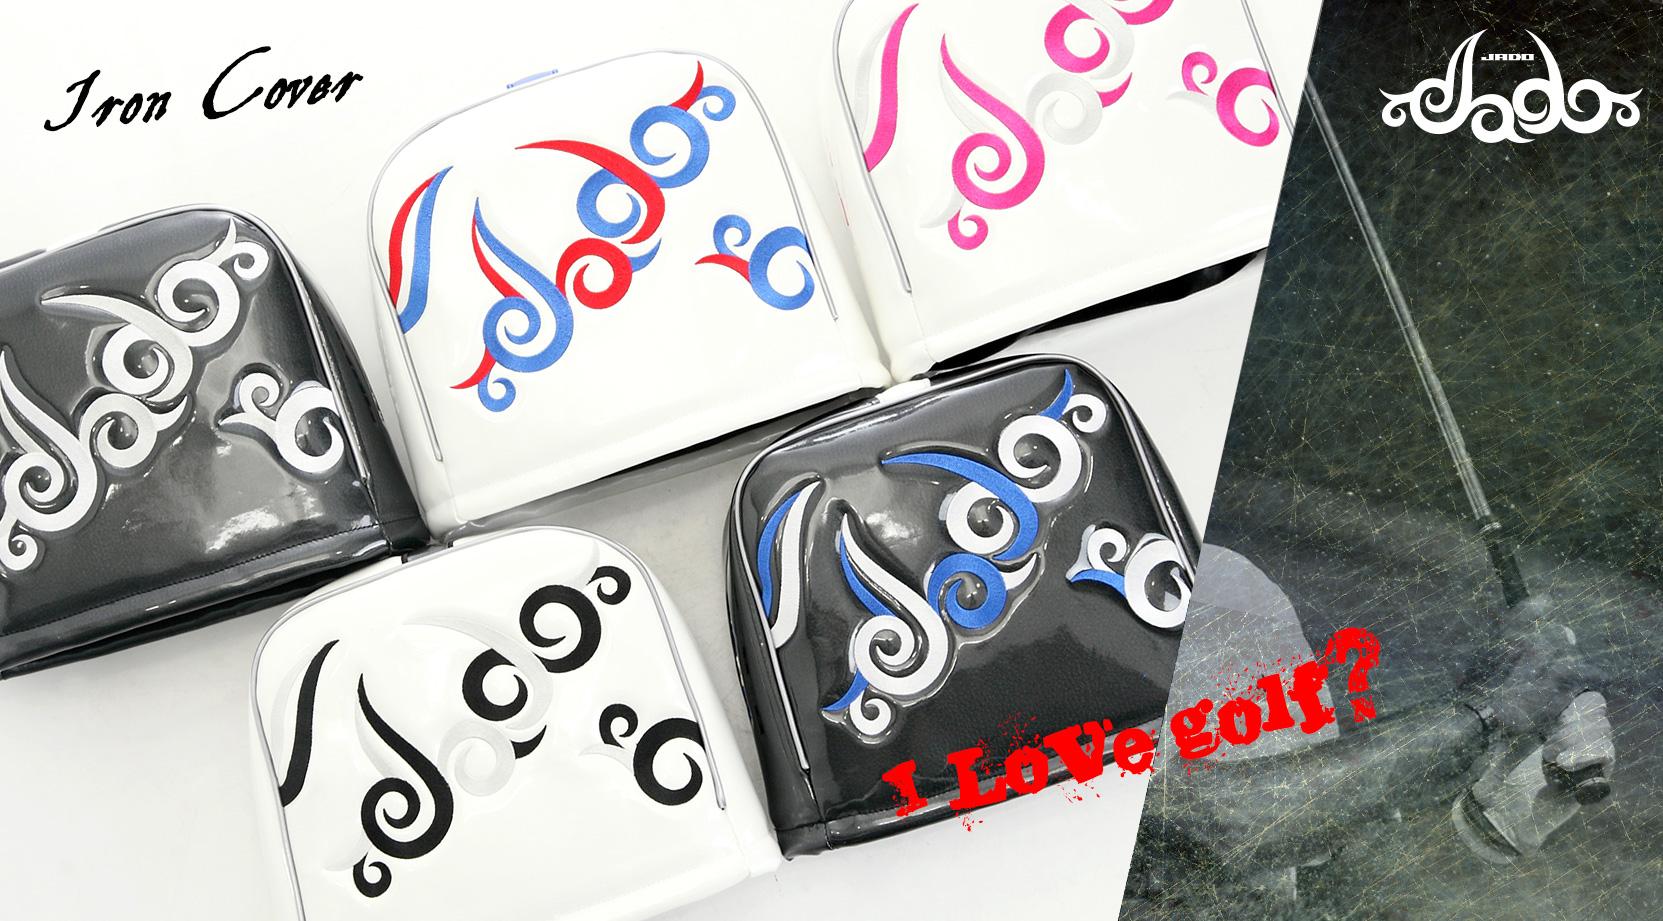 【Tatoo】ゴルフヘッドカバーアイアン用 4カラー